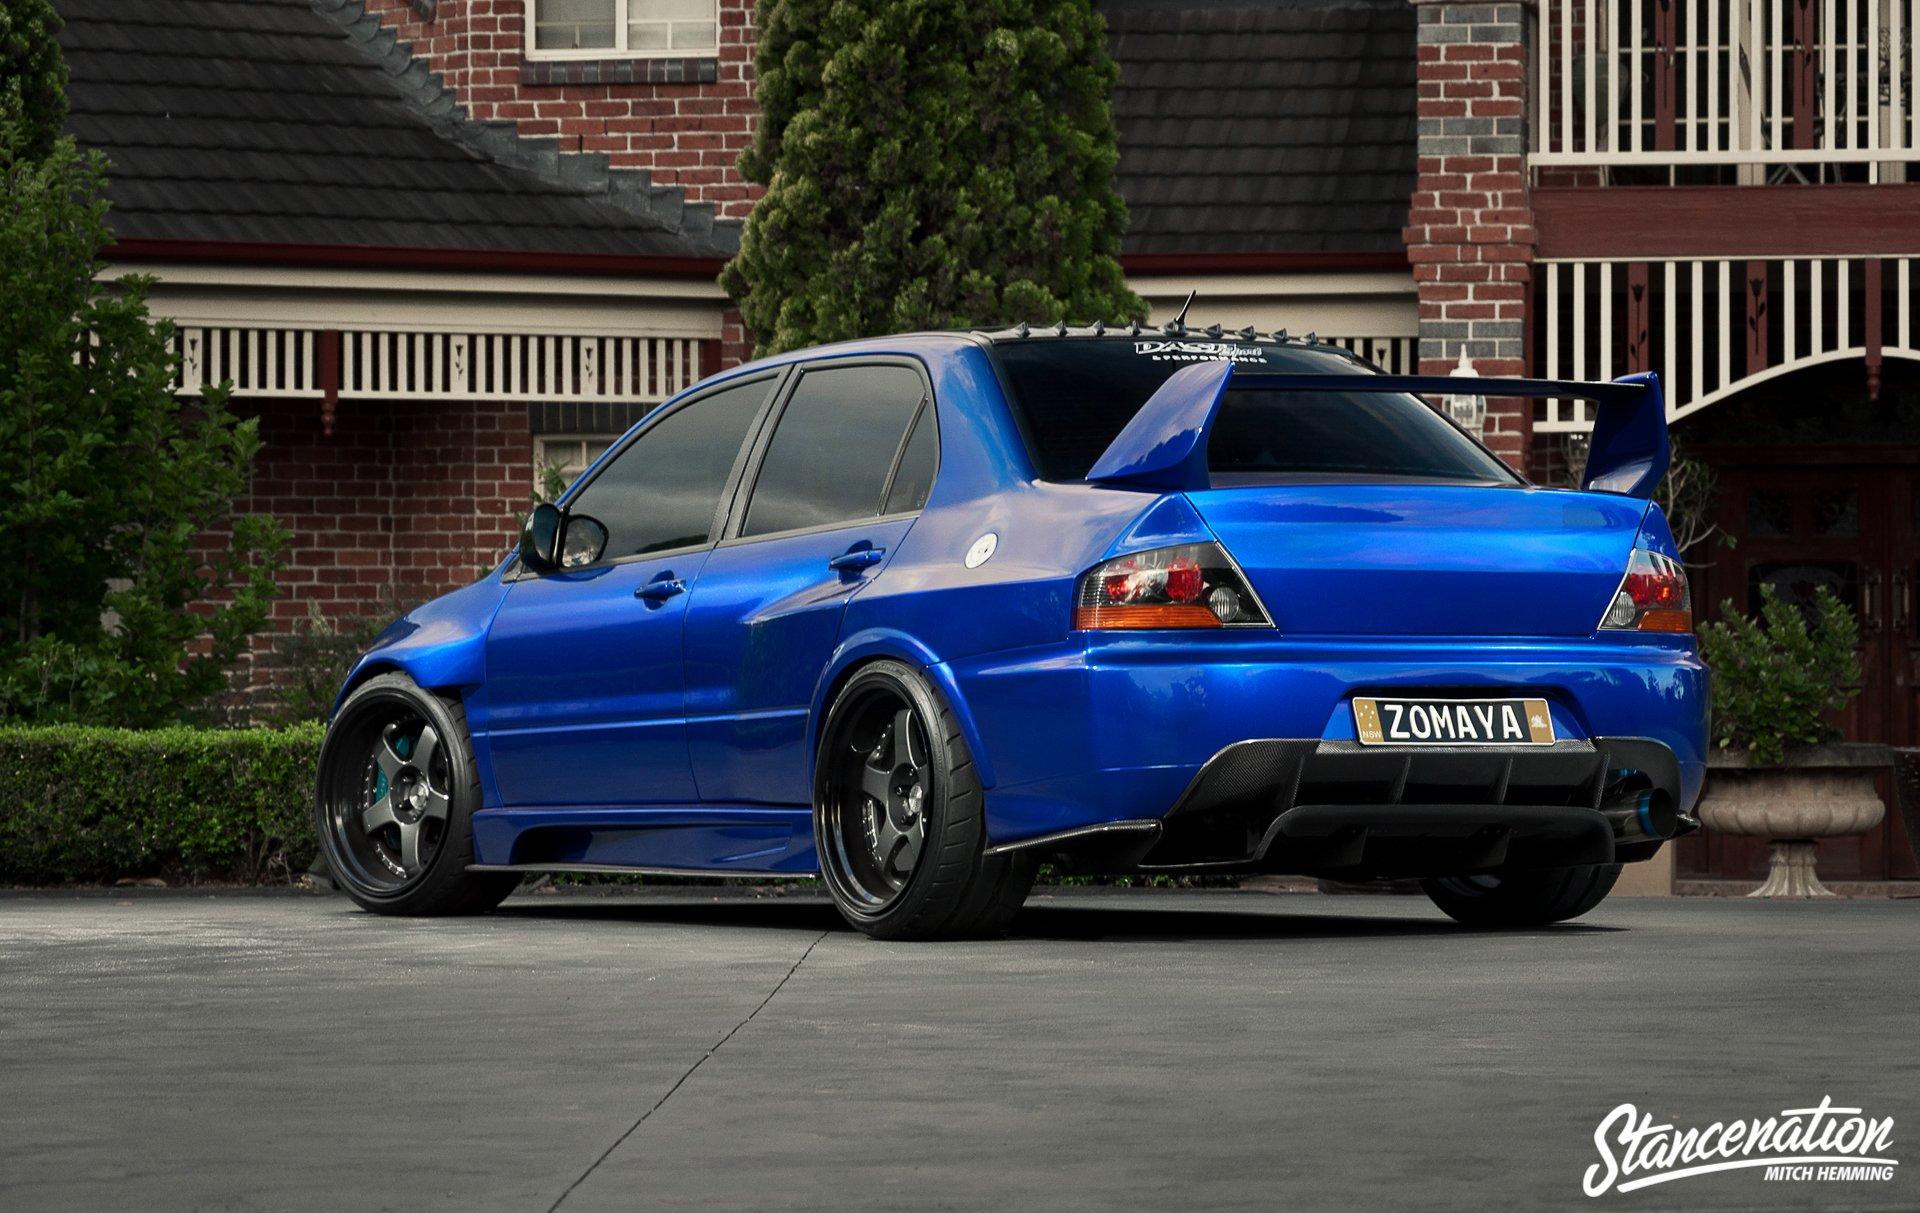 mitsubishi lancer evo ix blue cars sedan modified wallpaper 1920x1213 812917 wallpaperup - Mitsubishi Evo 9 Blue